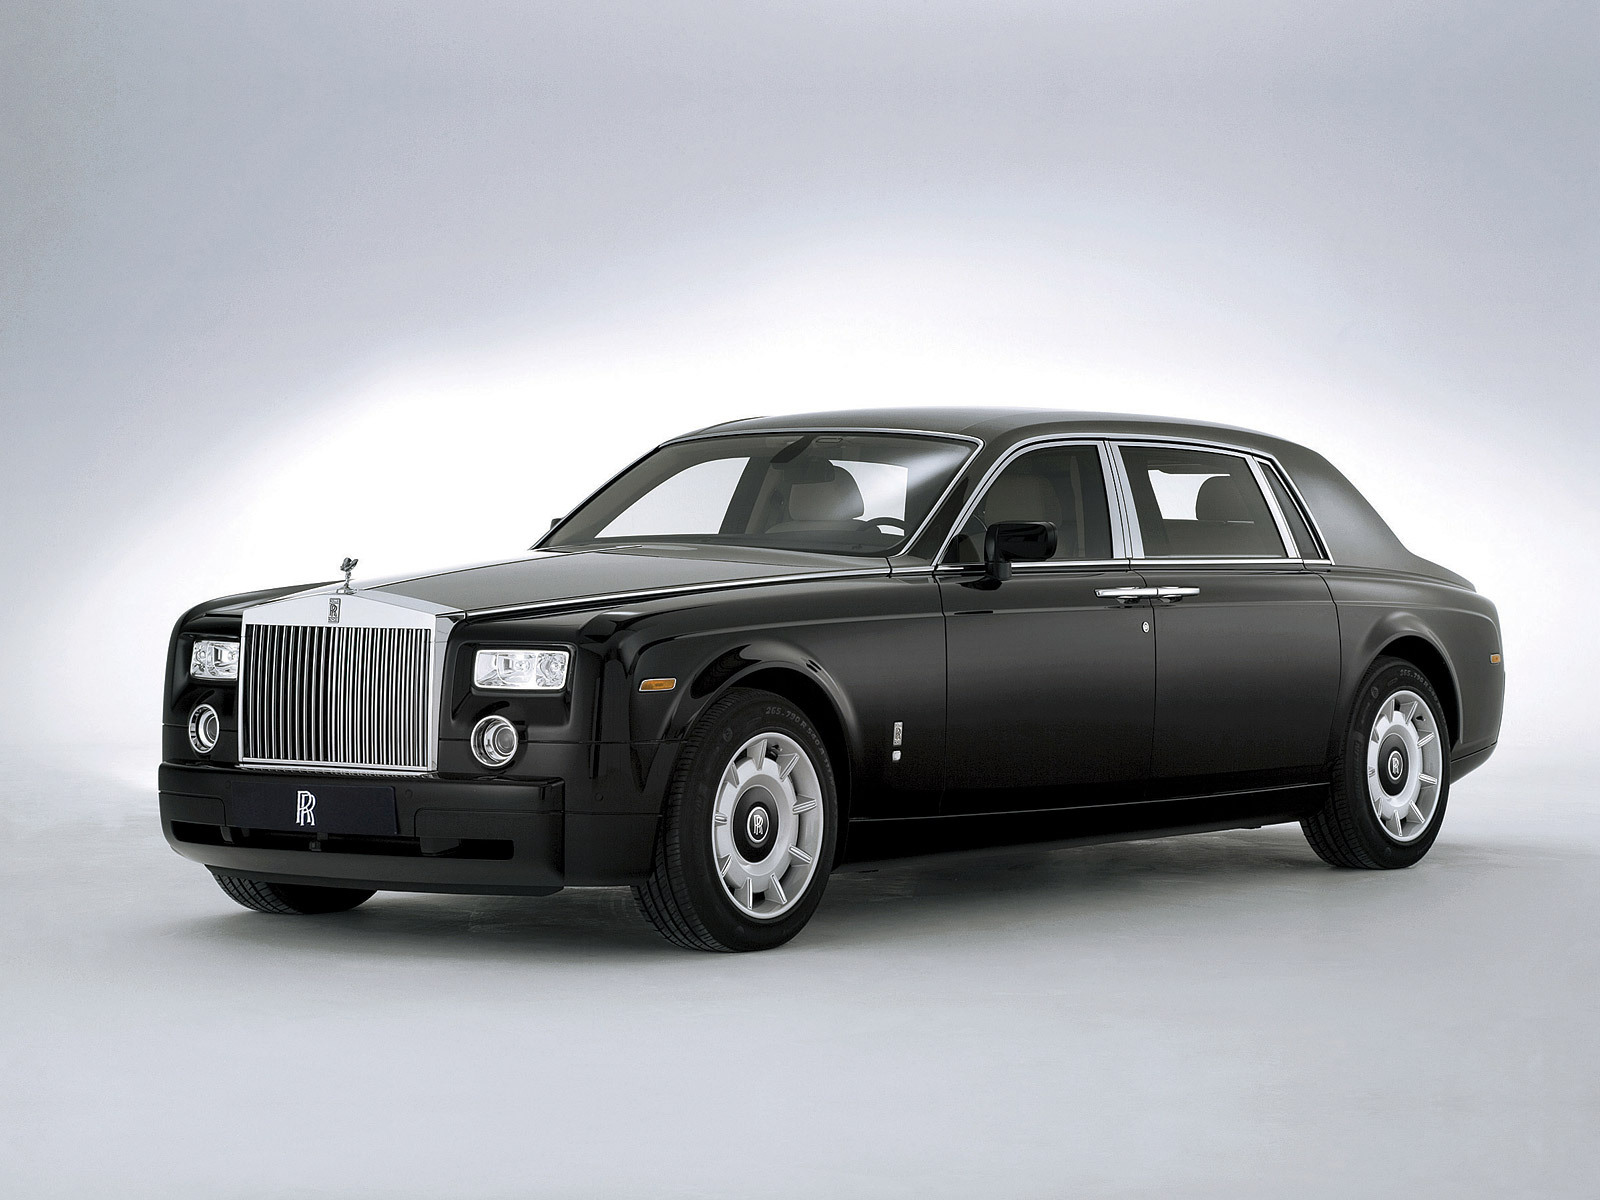 Rolls royce phantom 14 wide car wallpaper for Rolls royce motor cars